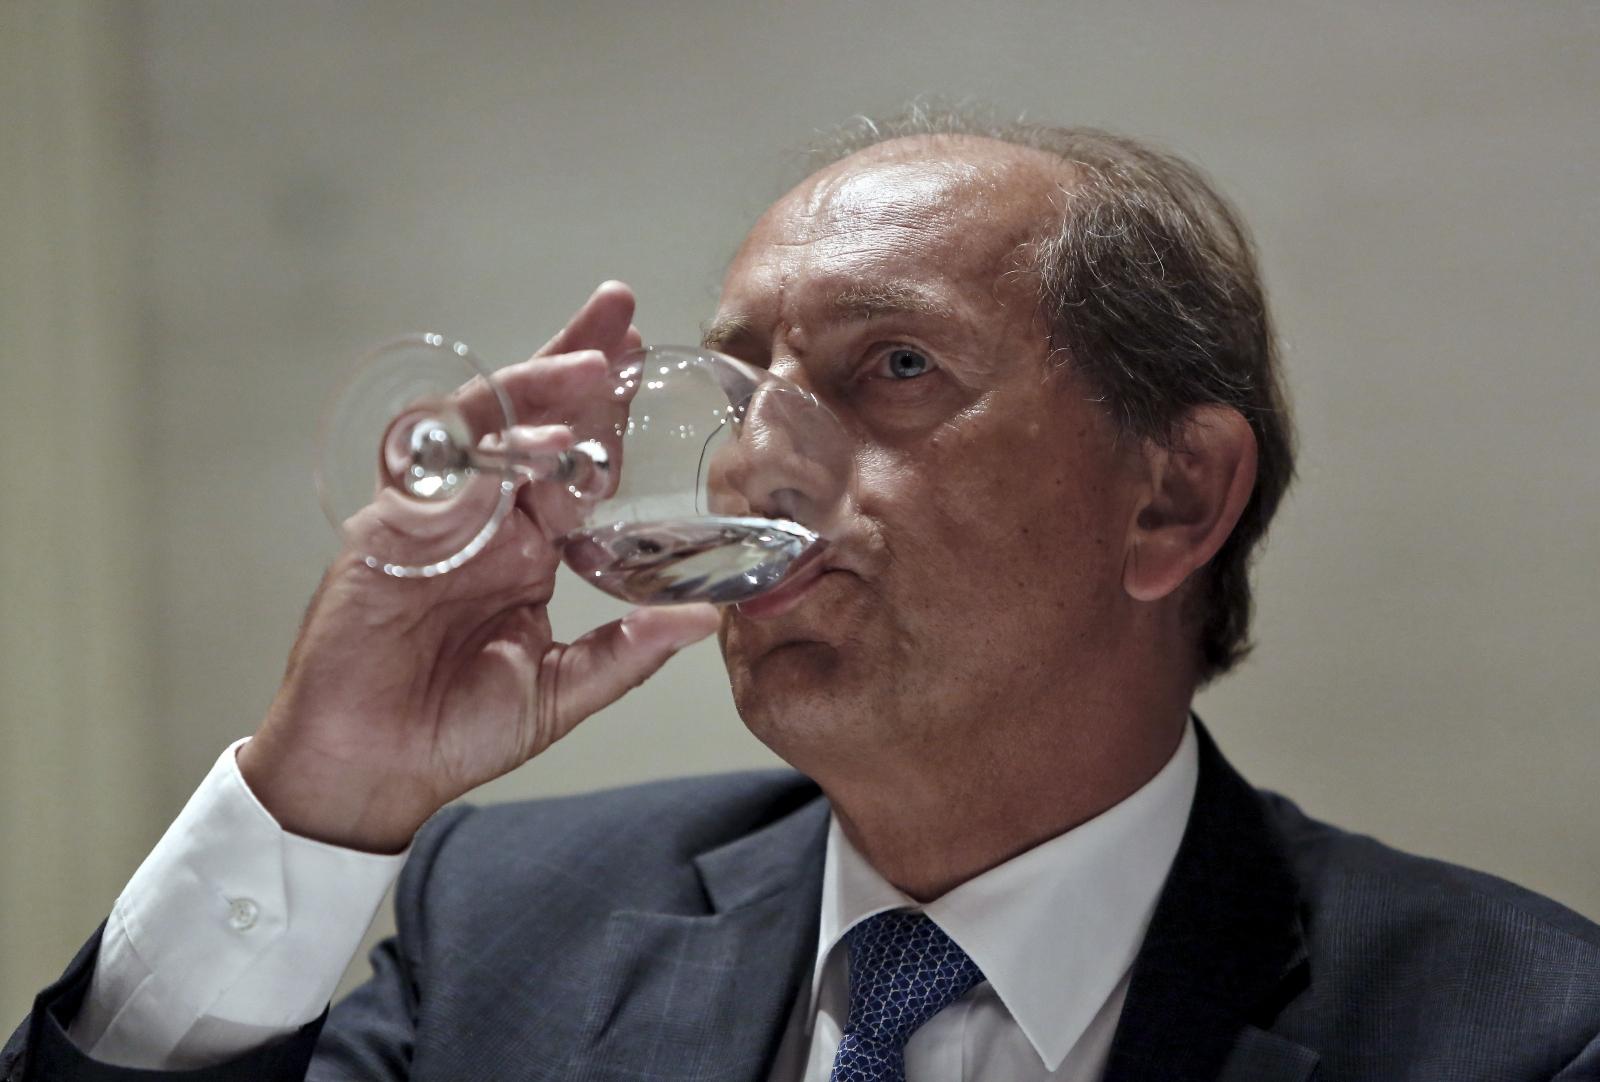 Nestle's global CEO Paul Bulcke